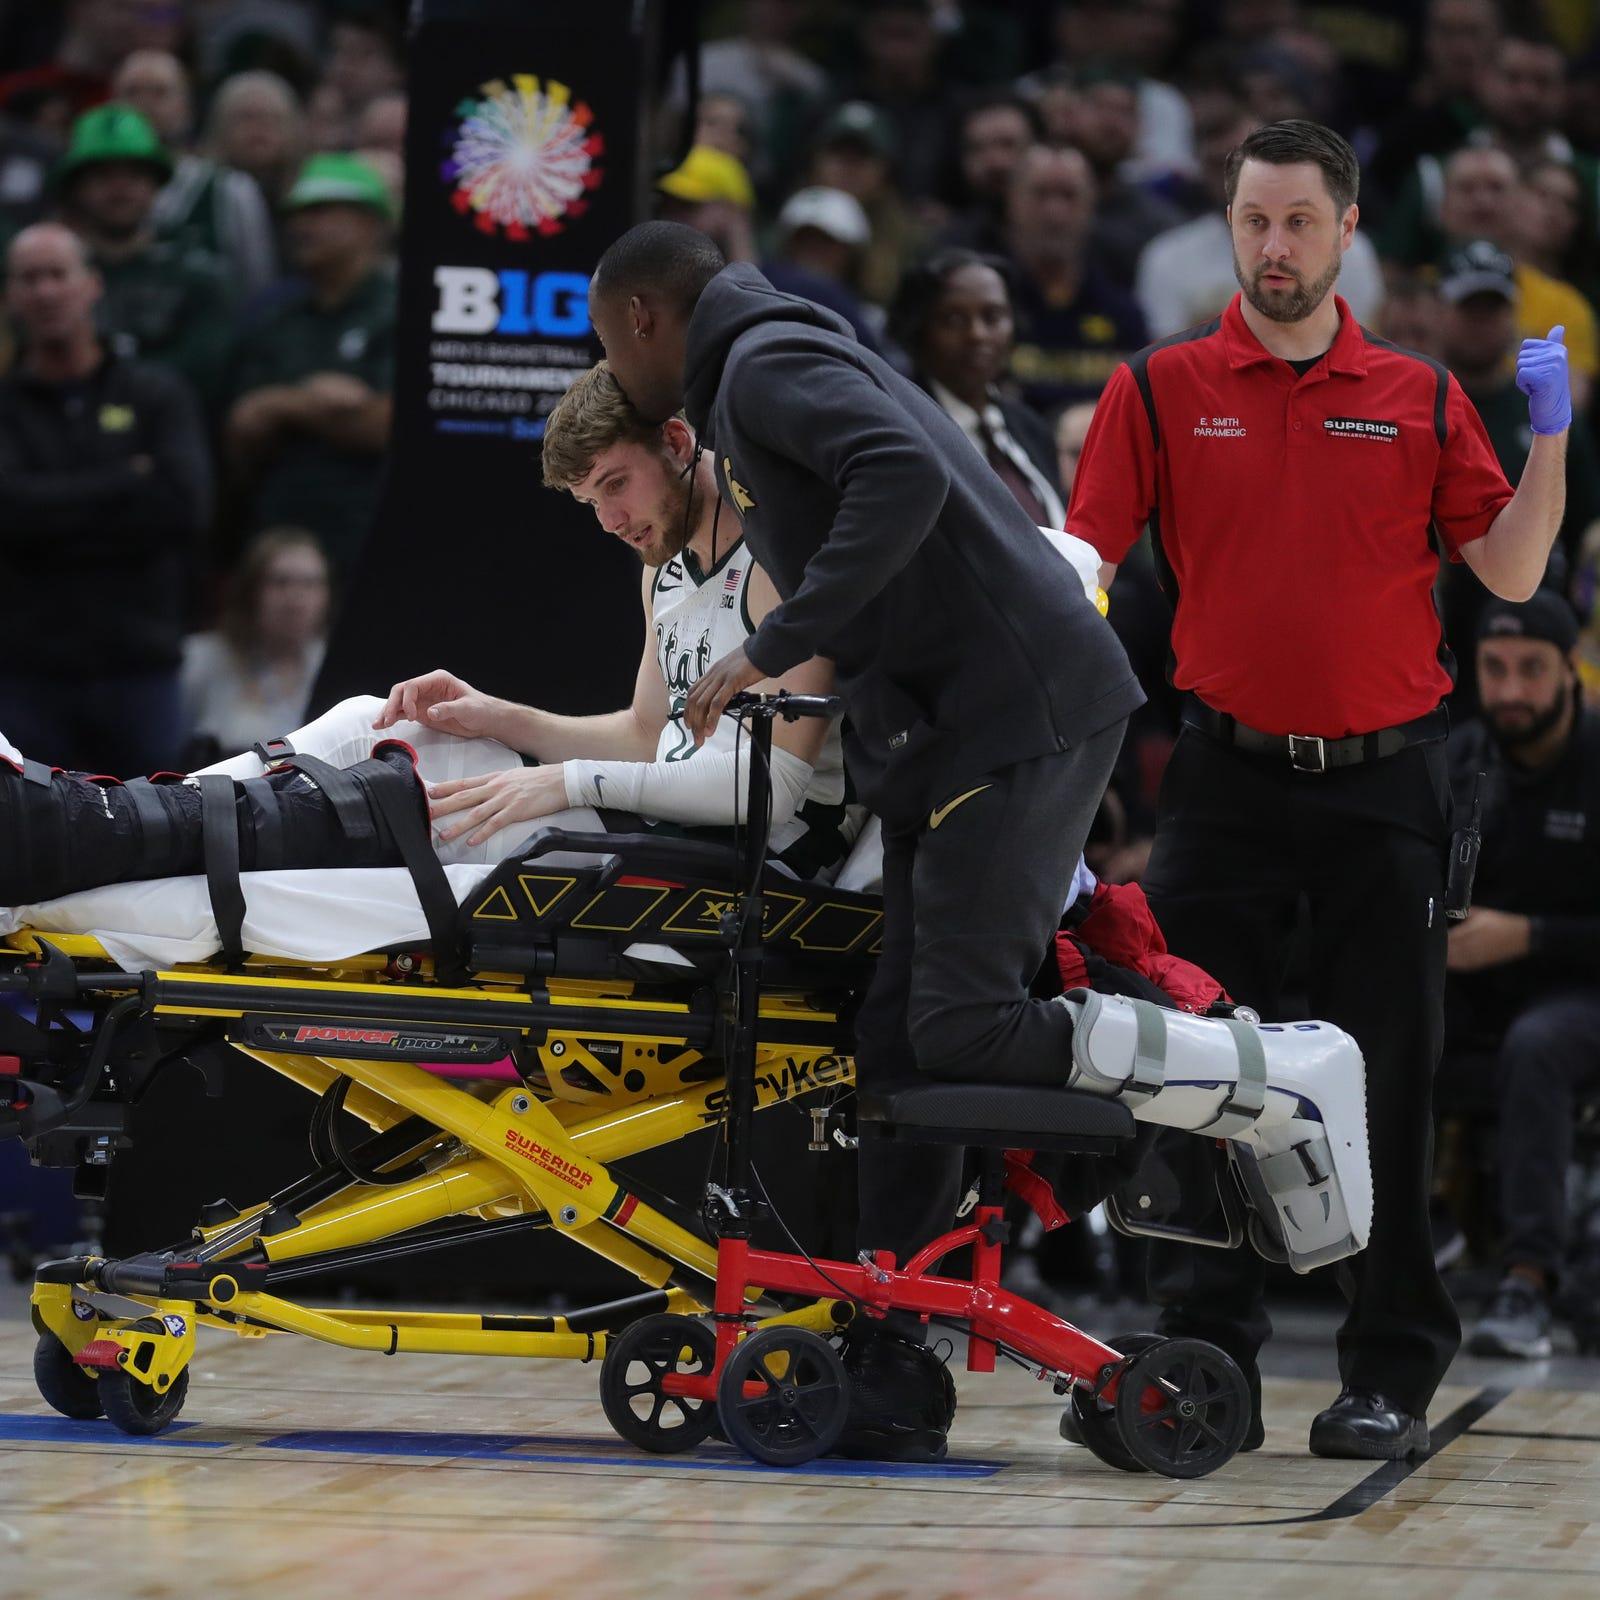 Michigan State basketball tough as nails. Just like Kyle Ahrens